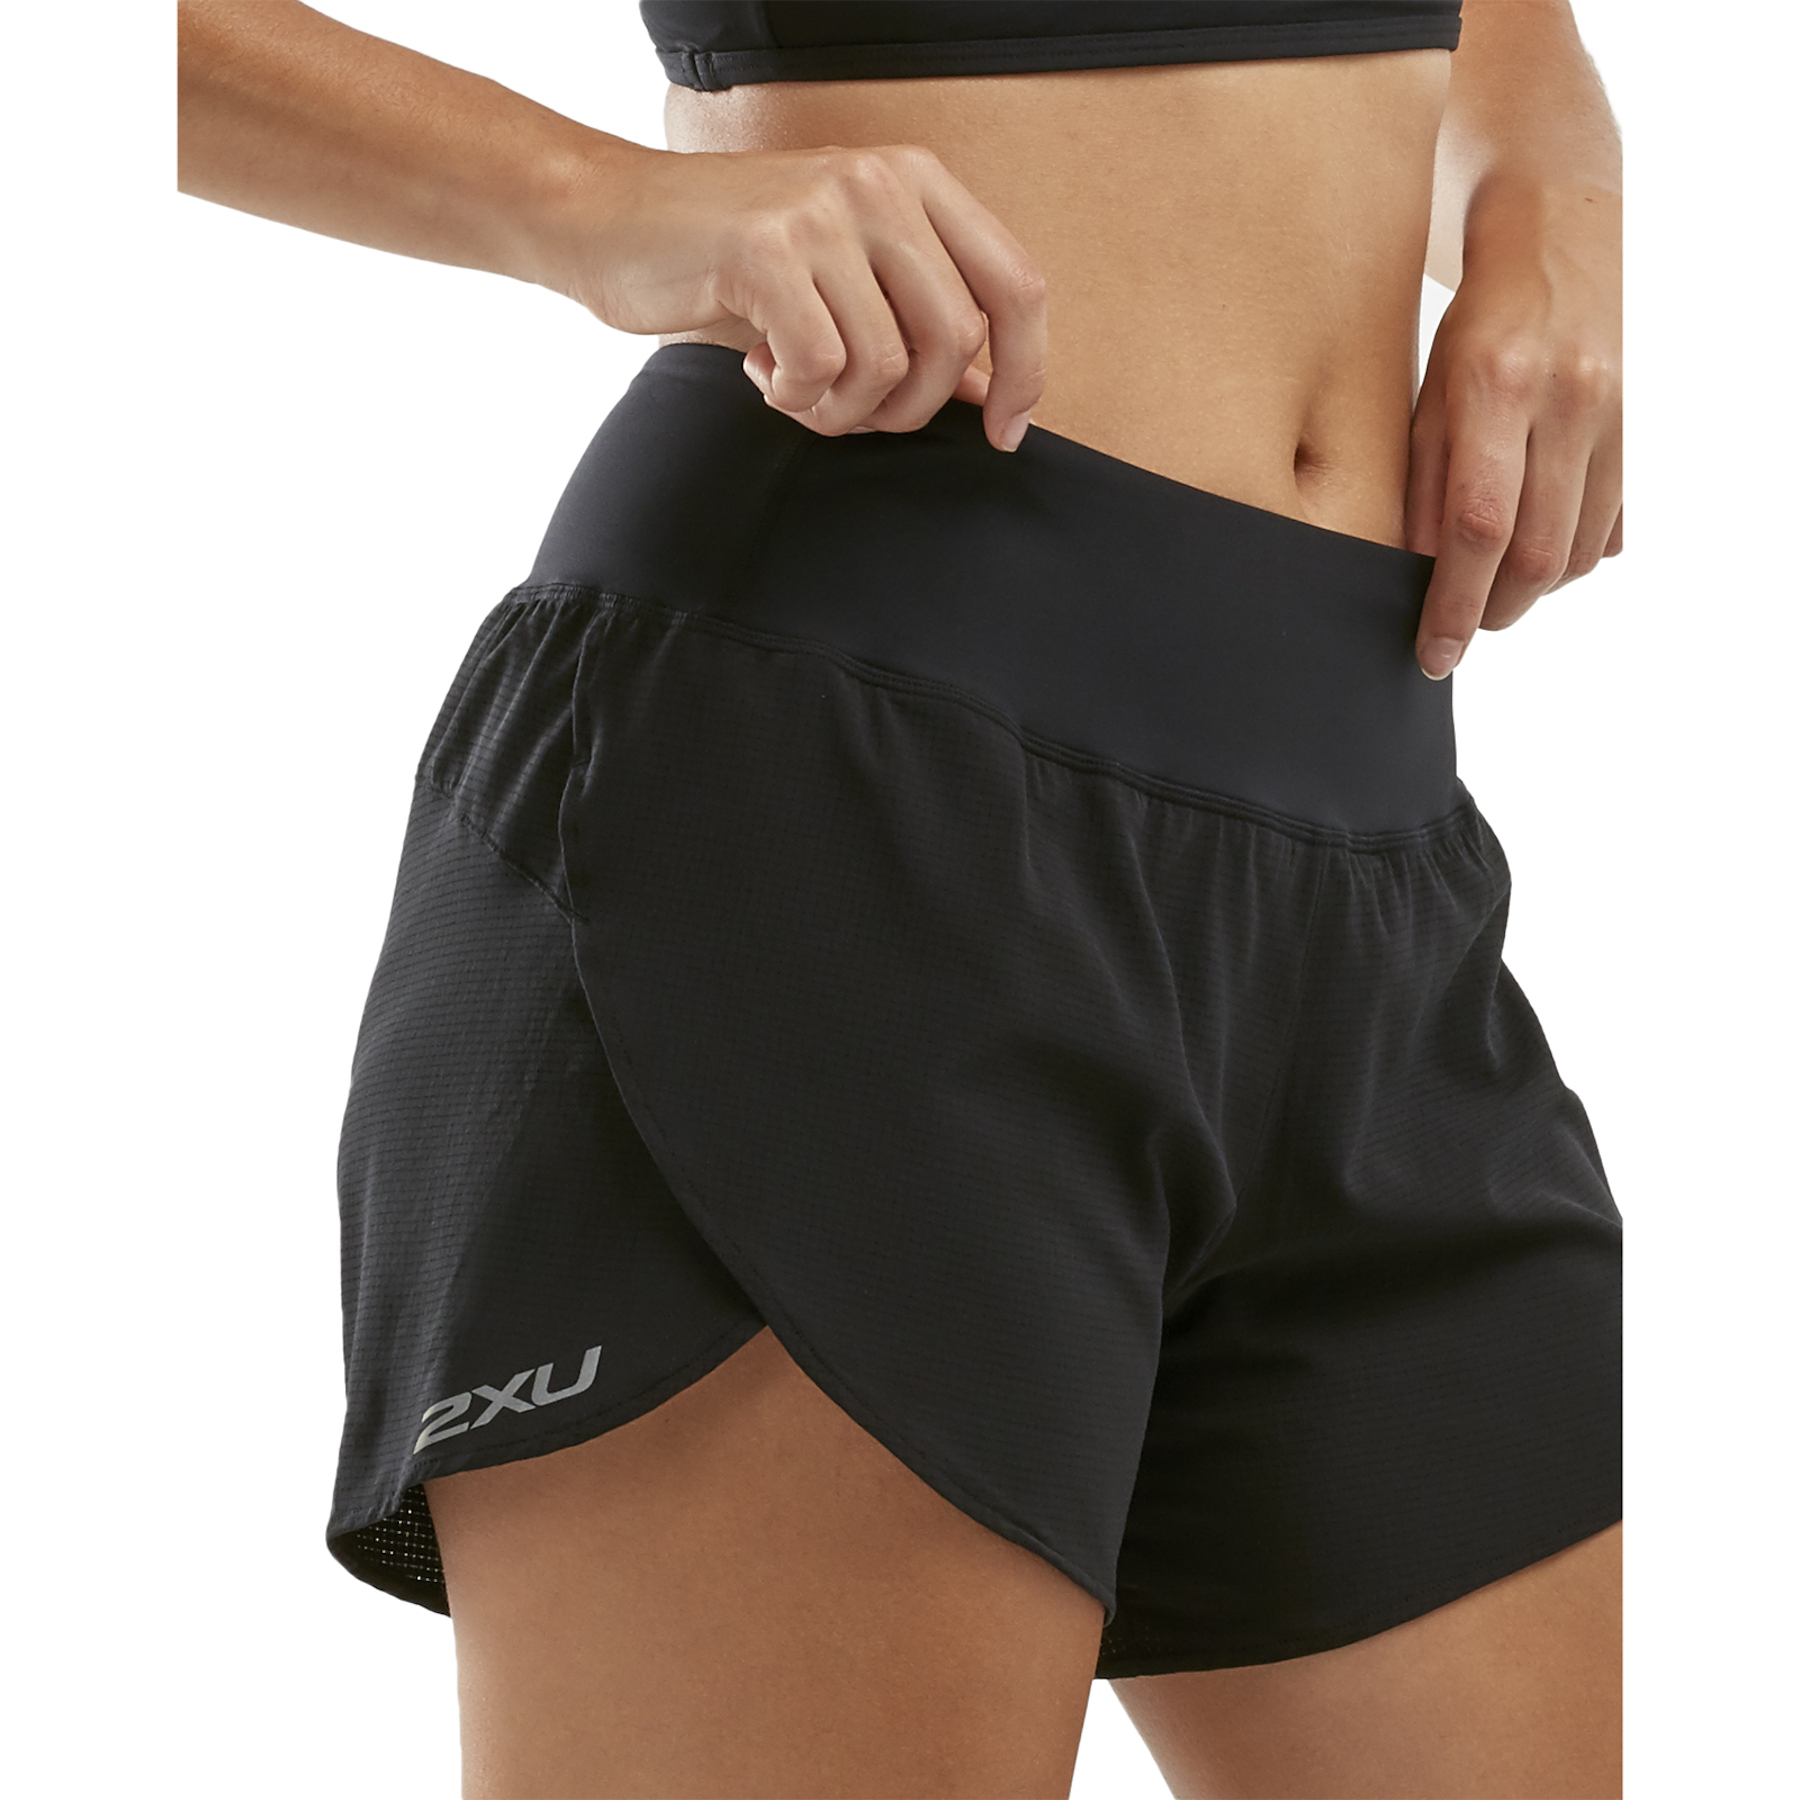 "Imagen de 2XU XVENT 4"" Women's Shorts with Brief - black/silver reflective"